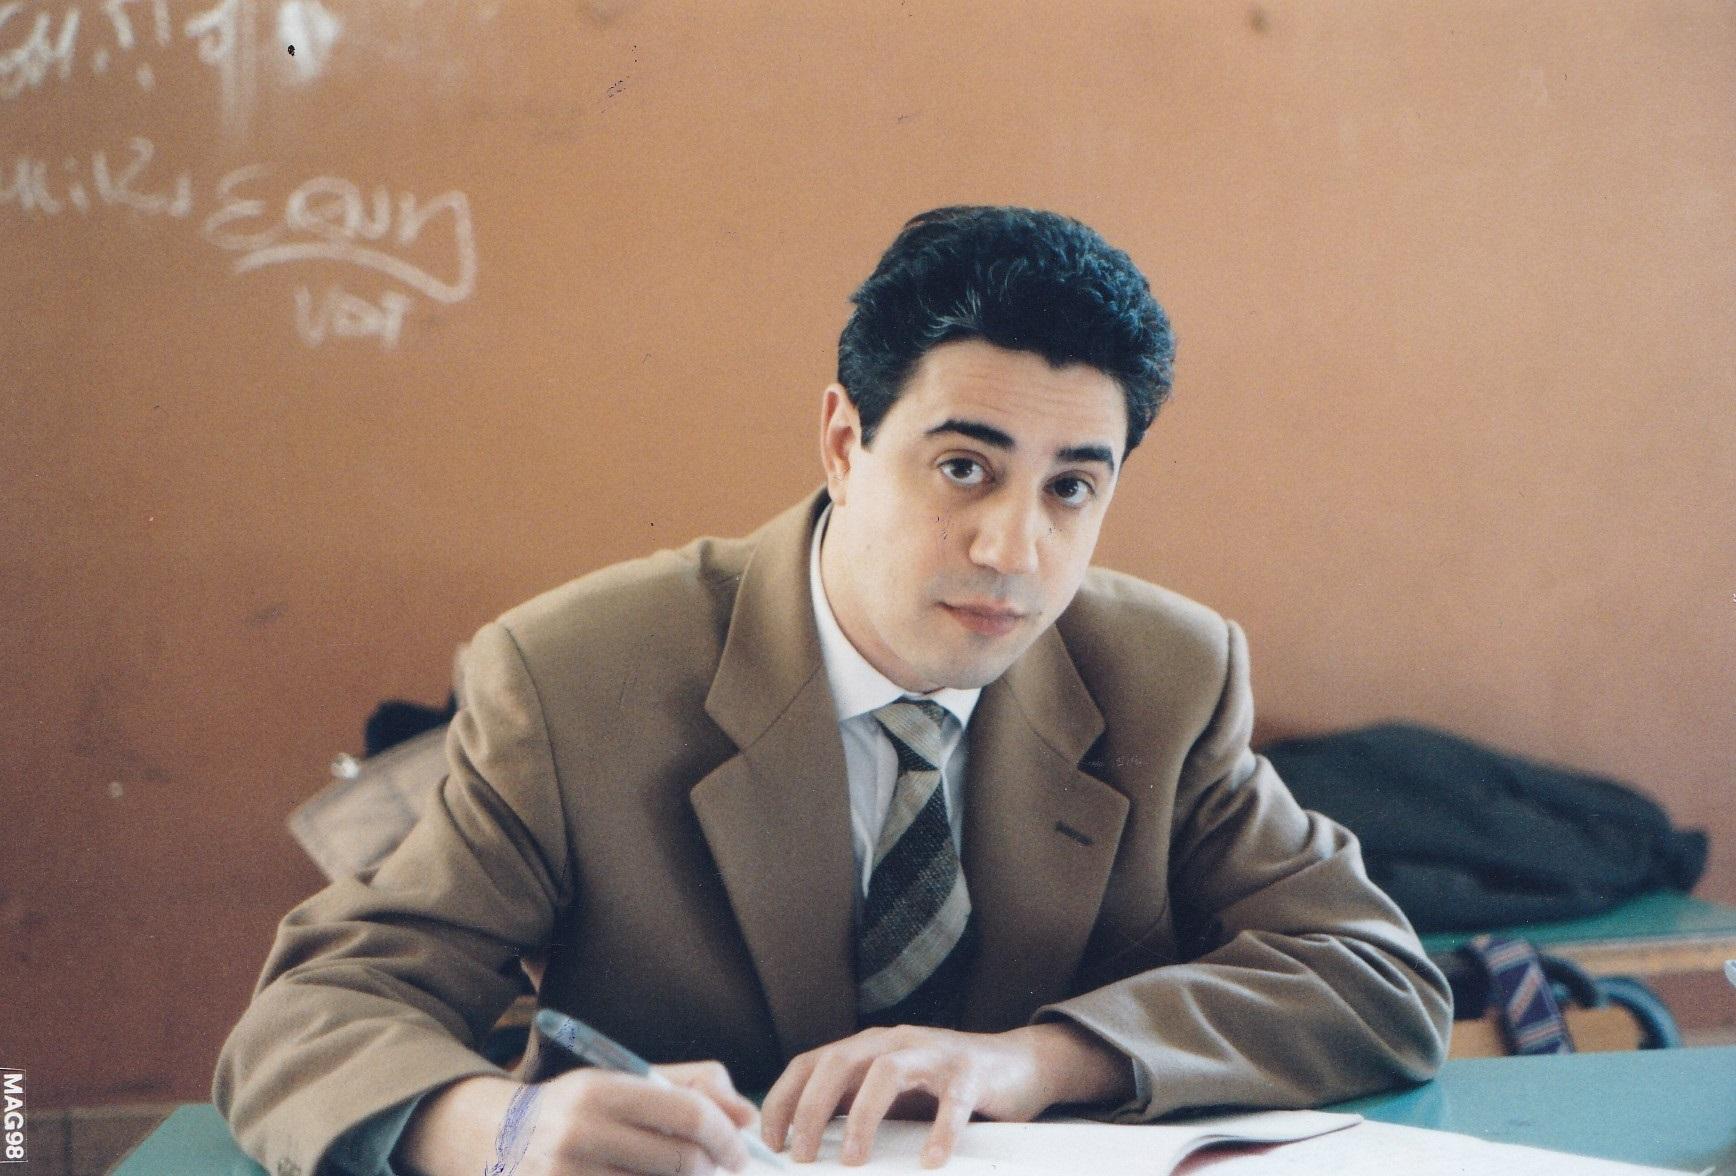 Fernando Fracassi - Music Teacher at Mamiani Lyceum of Rome (1986)